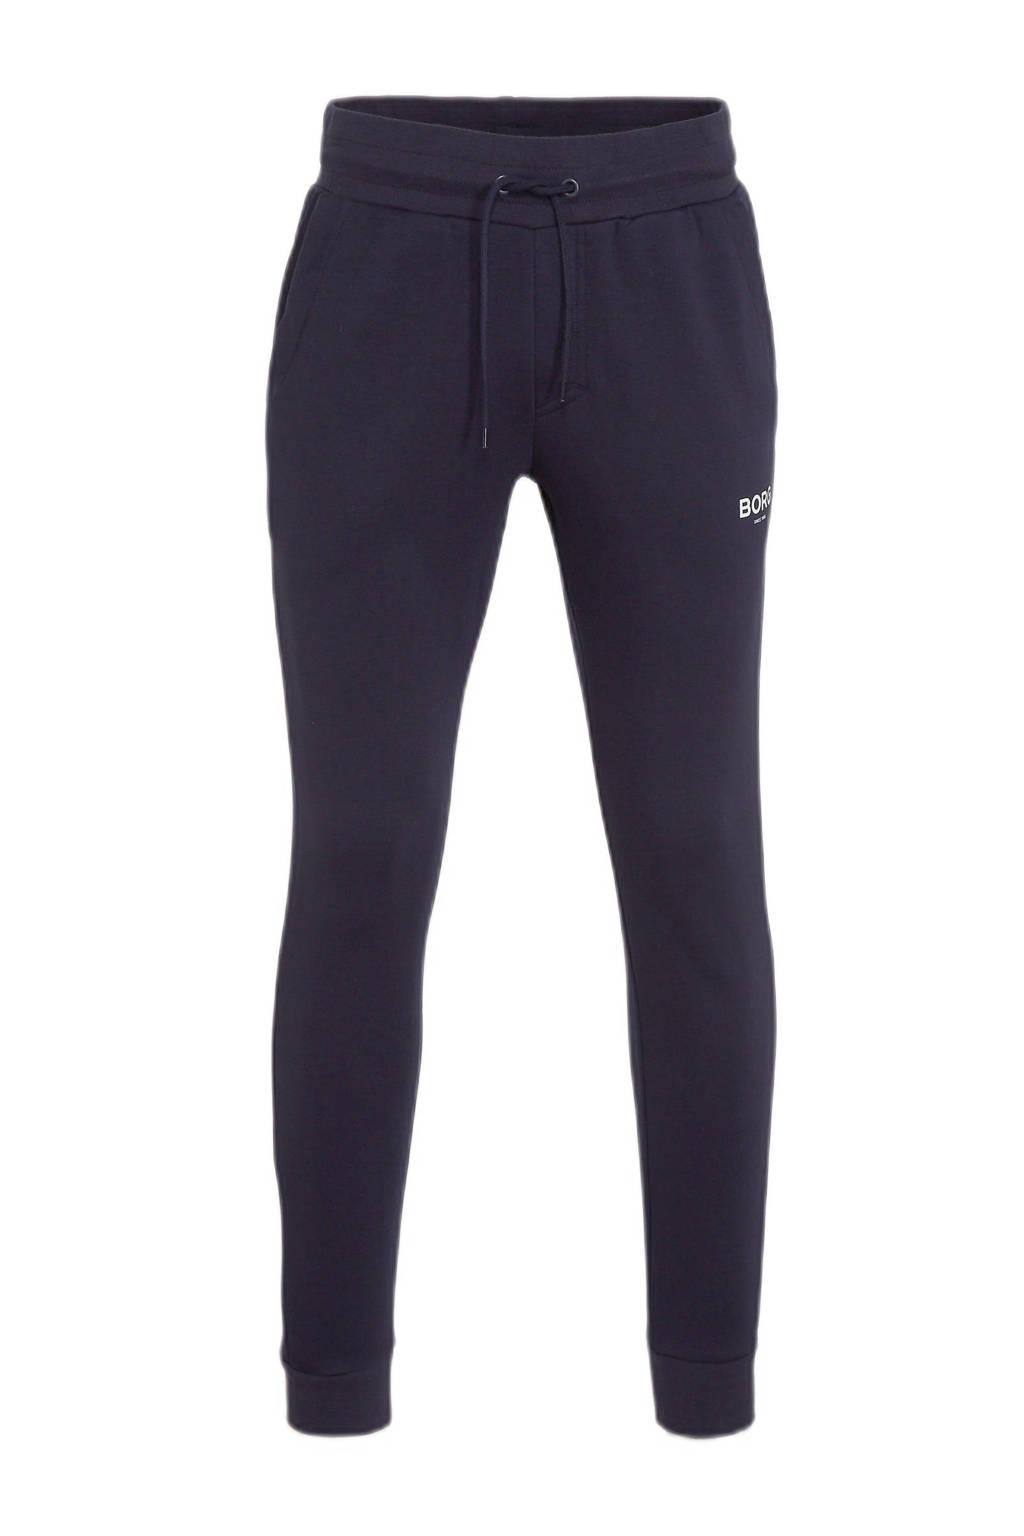 Björn Borg   joggingbroek donkerblauw, Donkerblauw